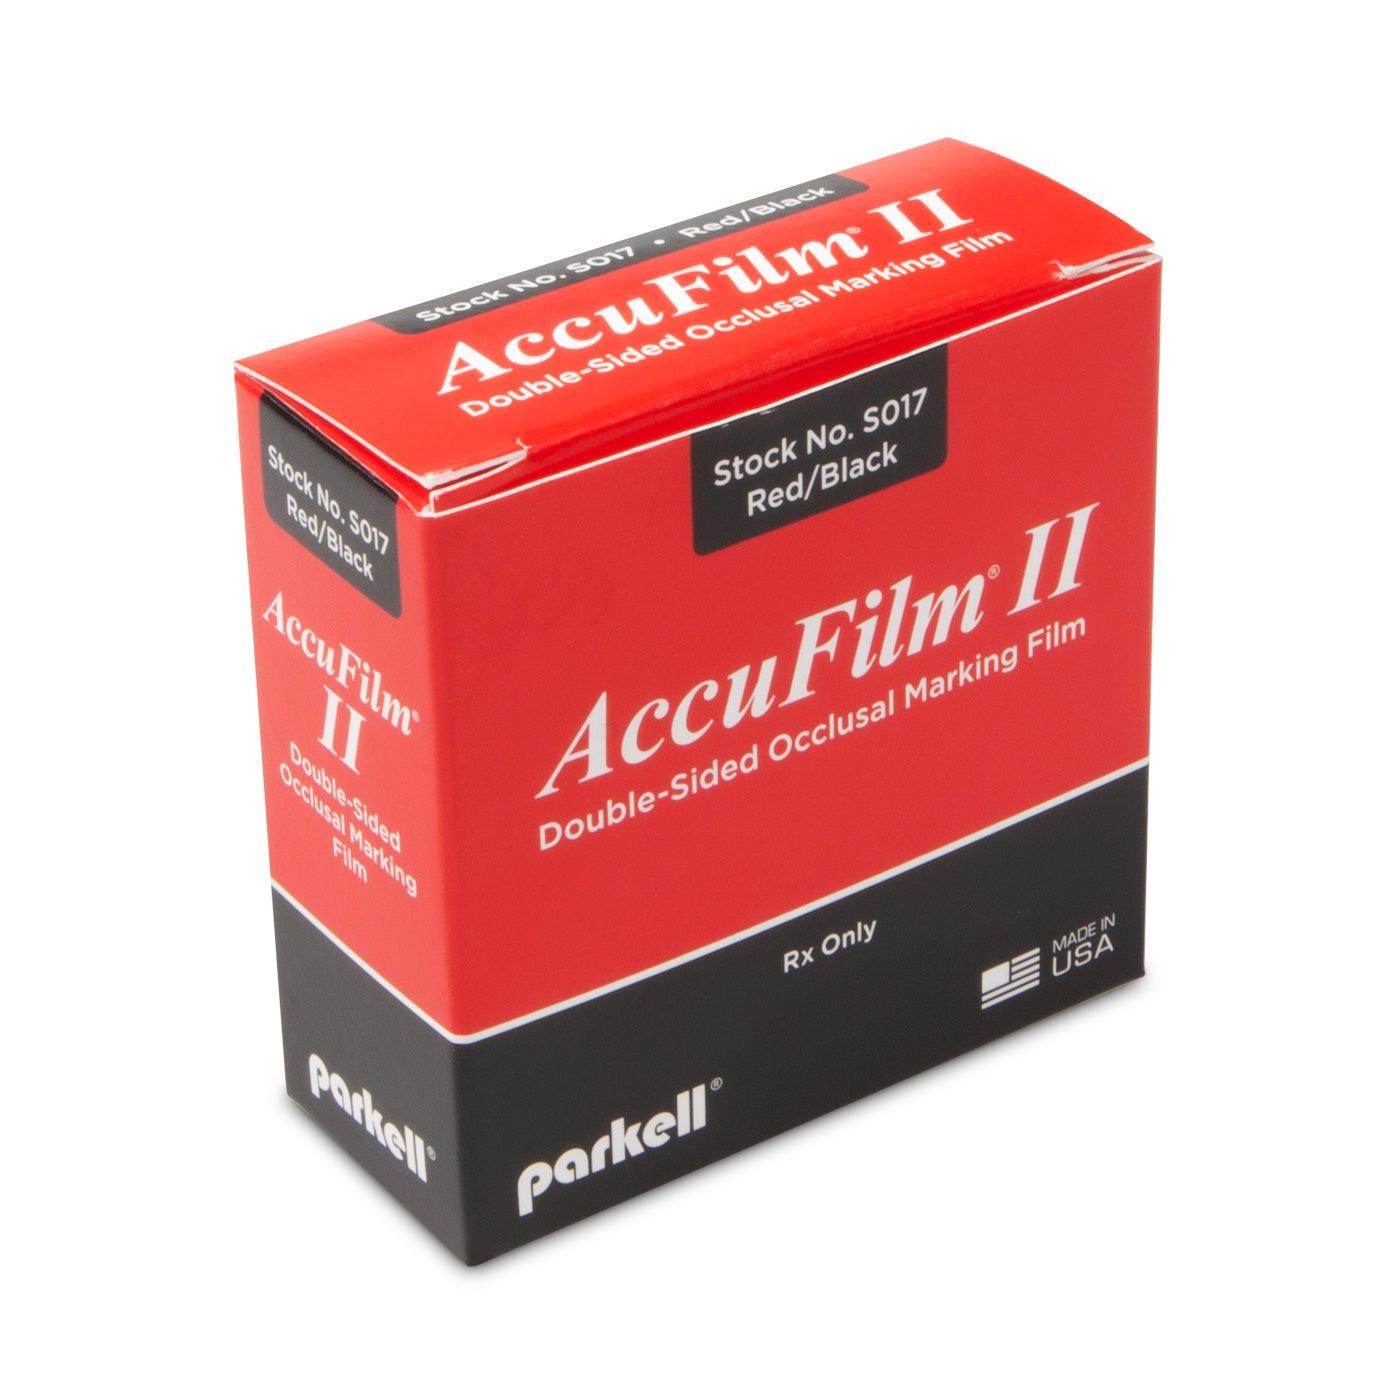 Dental Laser - Articulating Film - occlusal marking strips